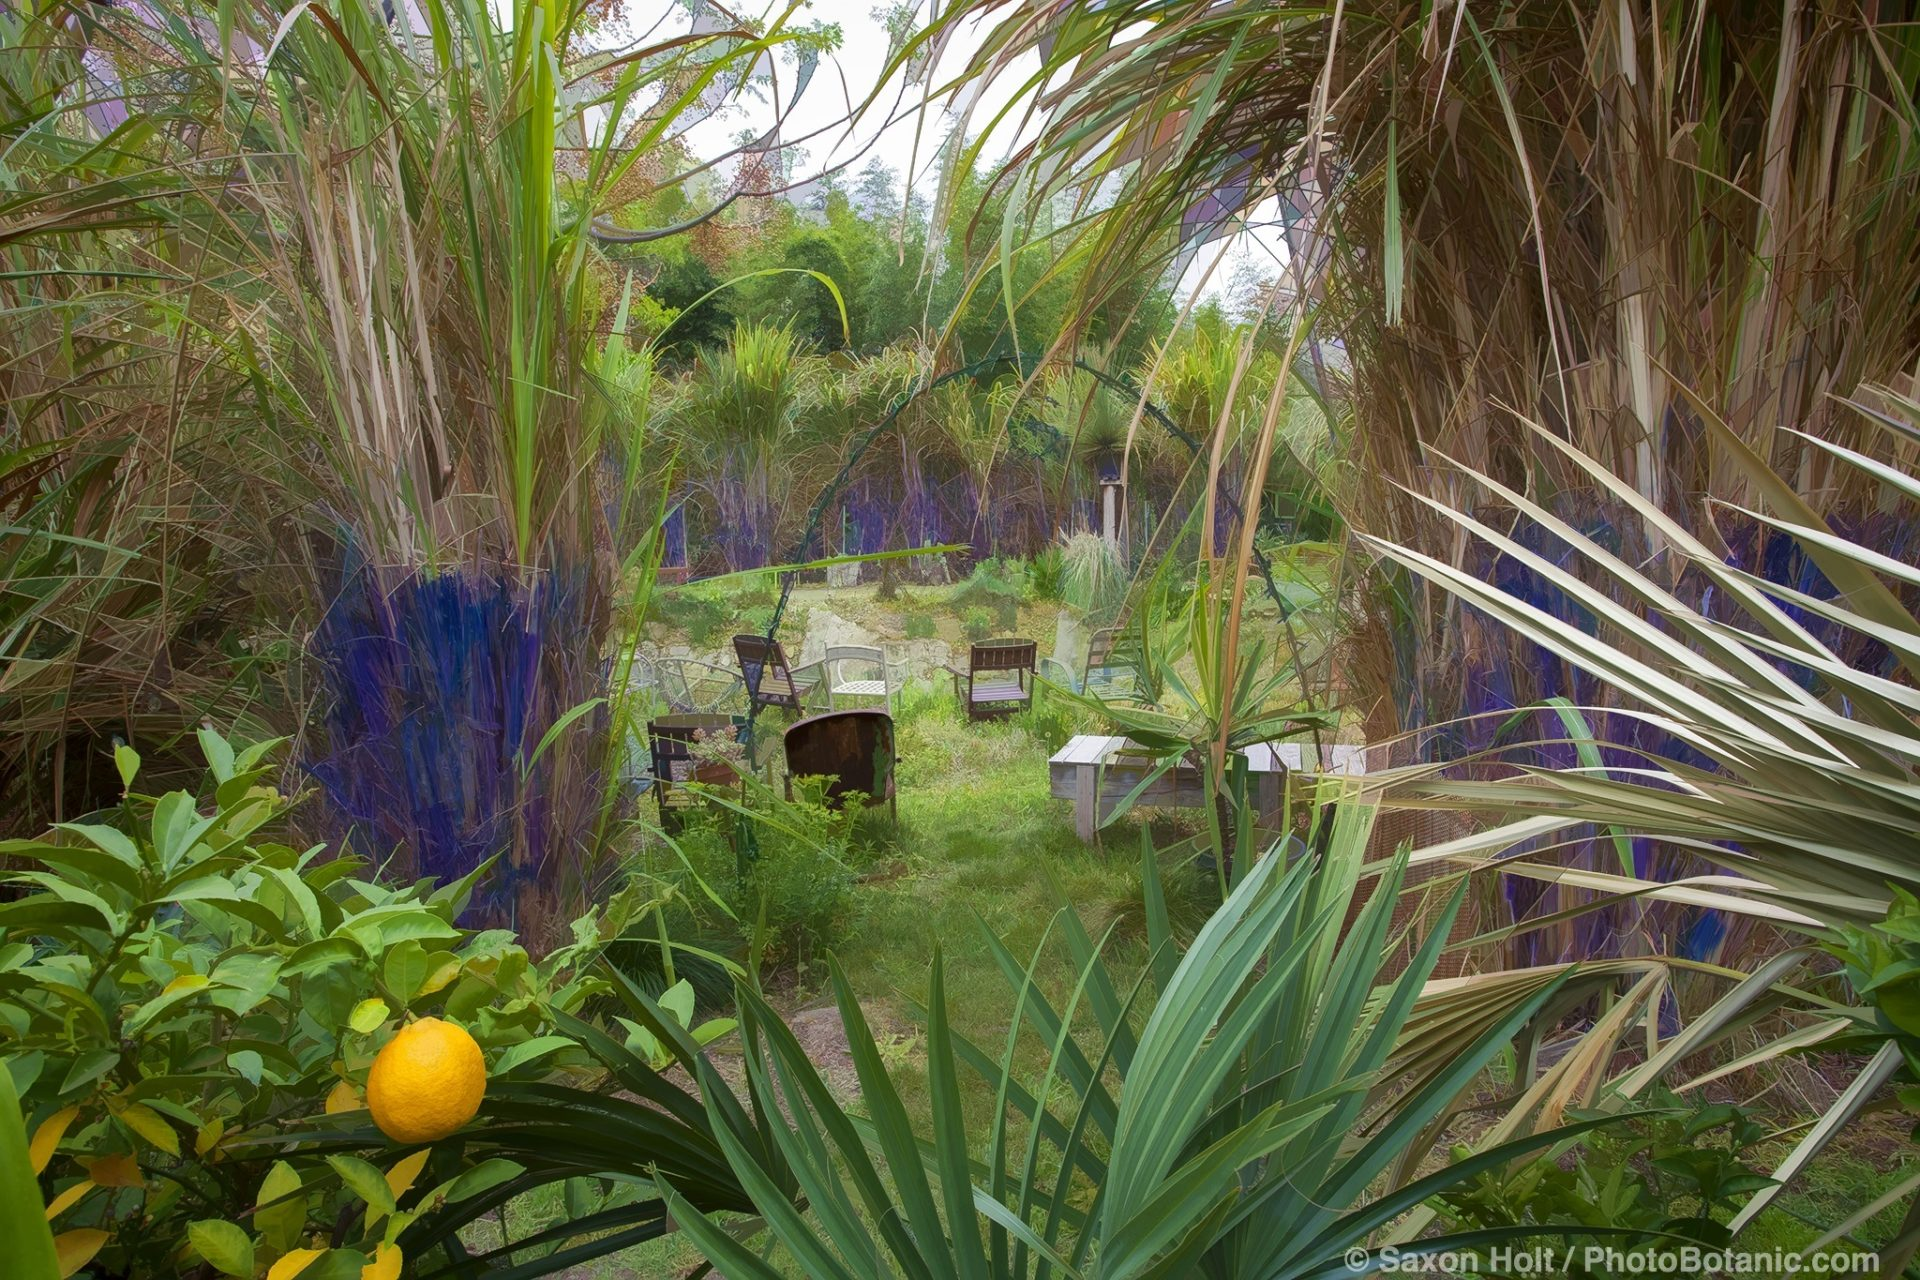 John Greenlee's Pomona garden